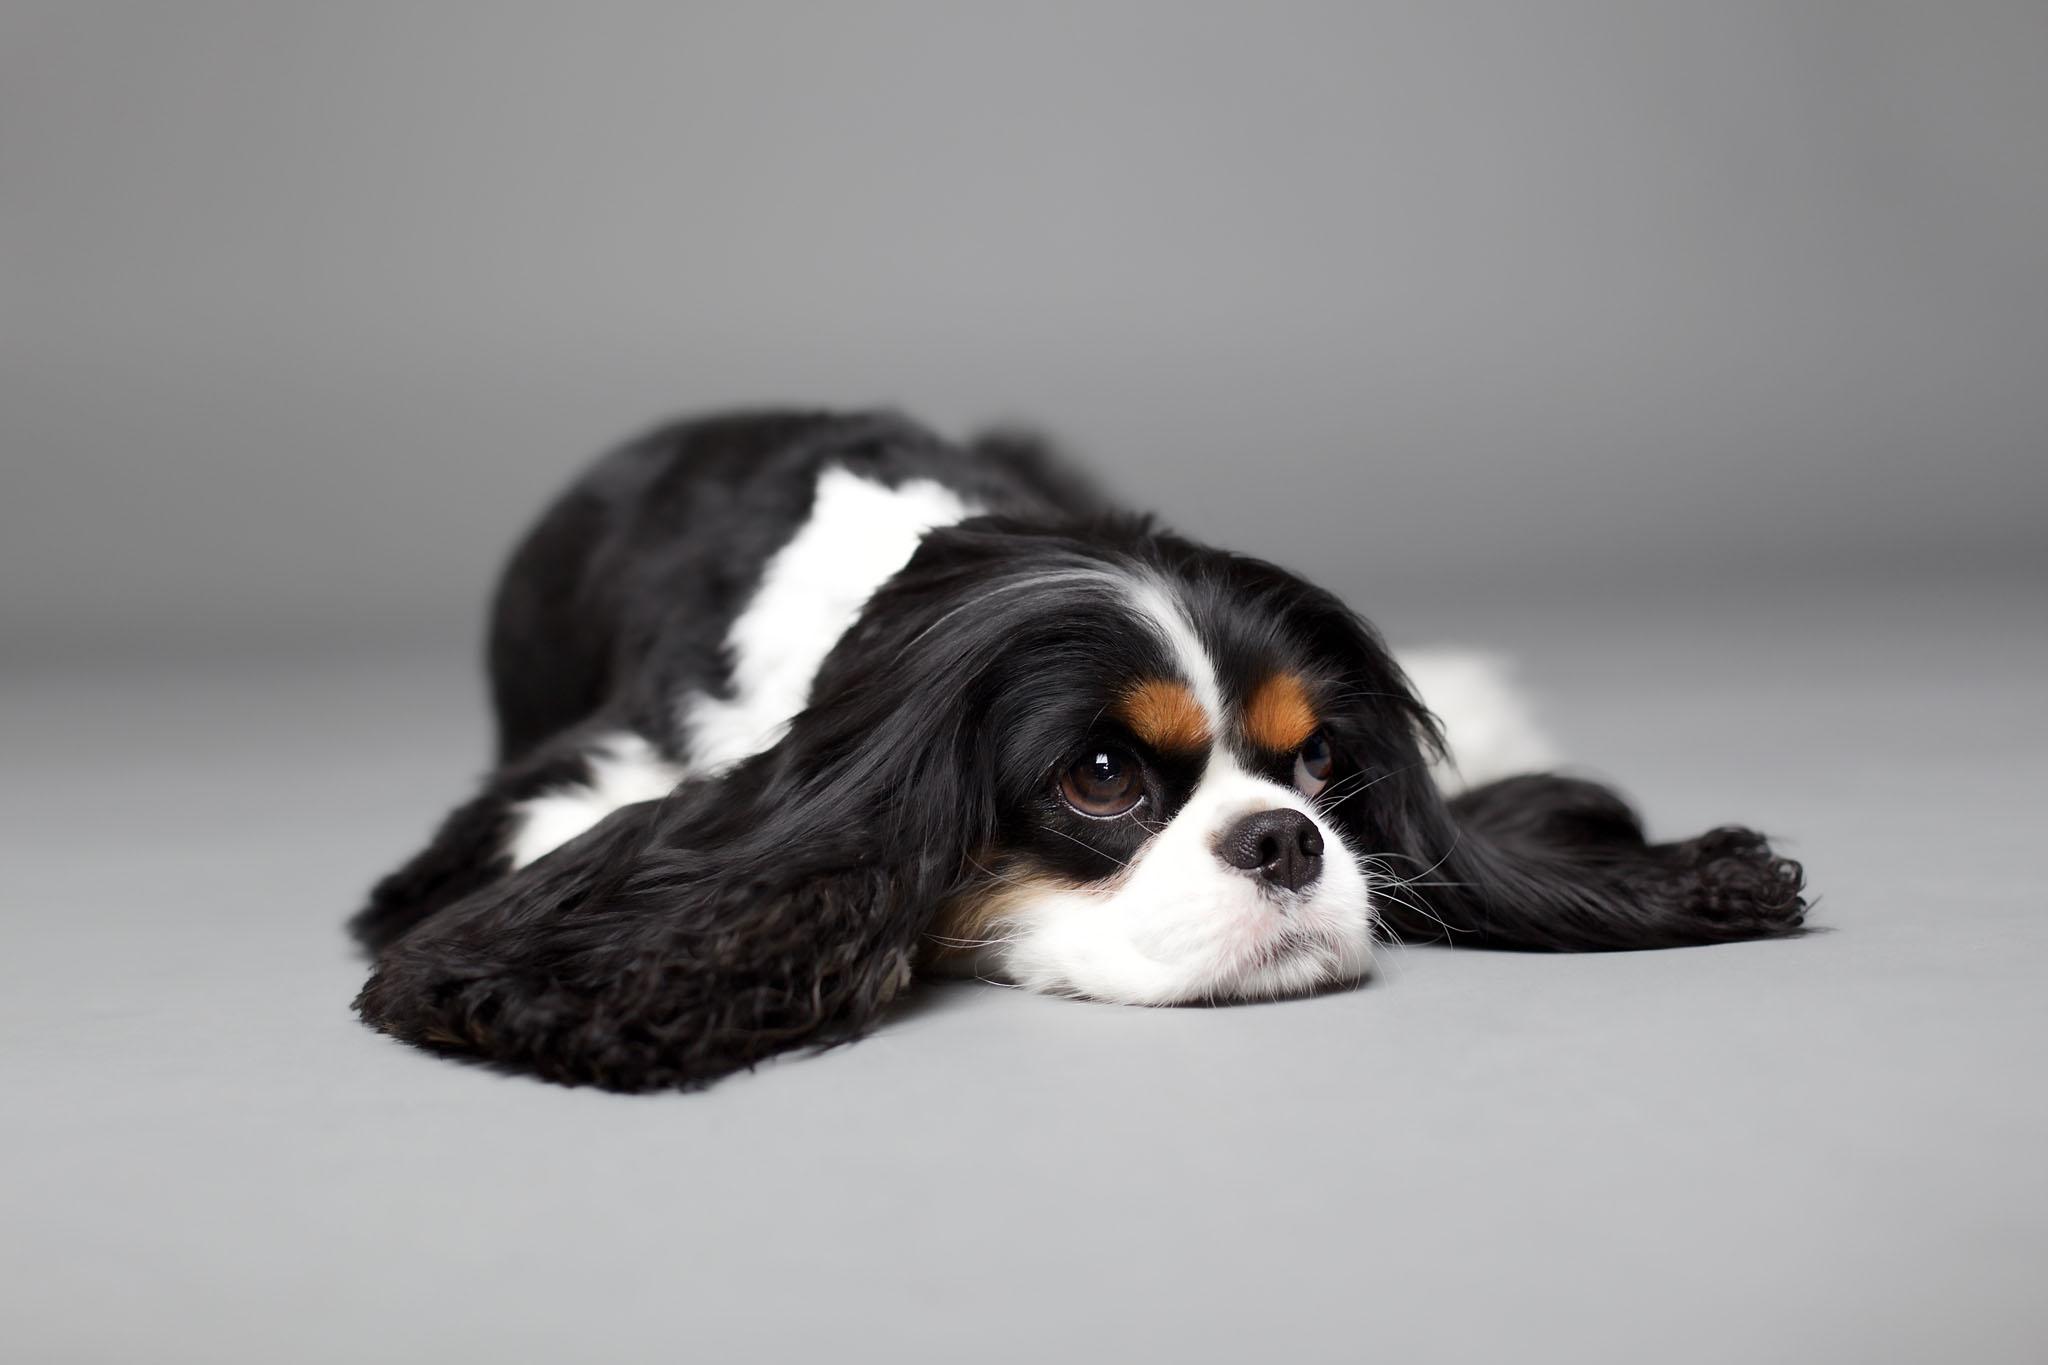 boprey-pet-photography-studio-nyc_28.jpg